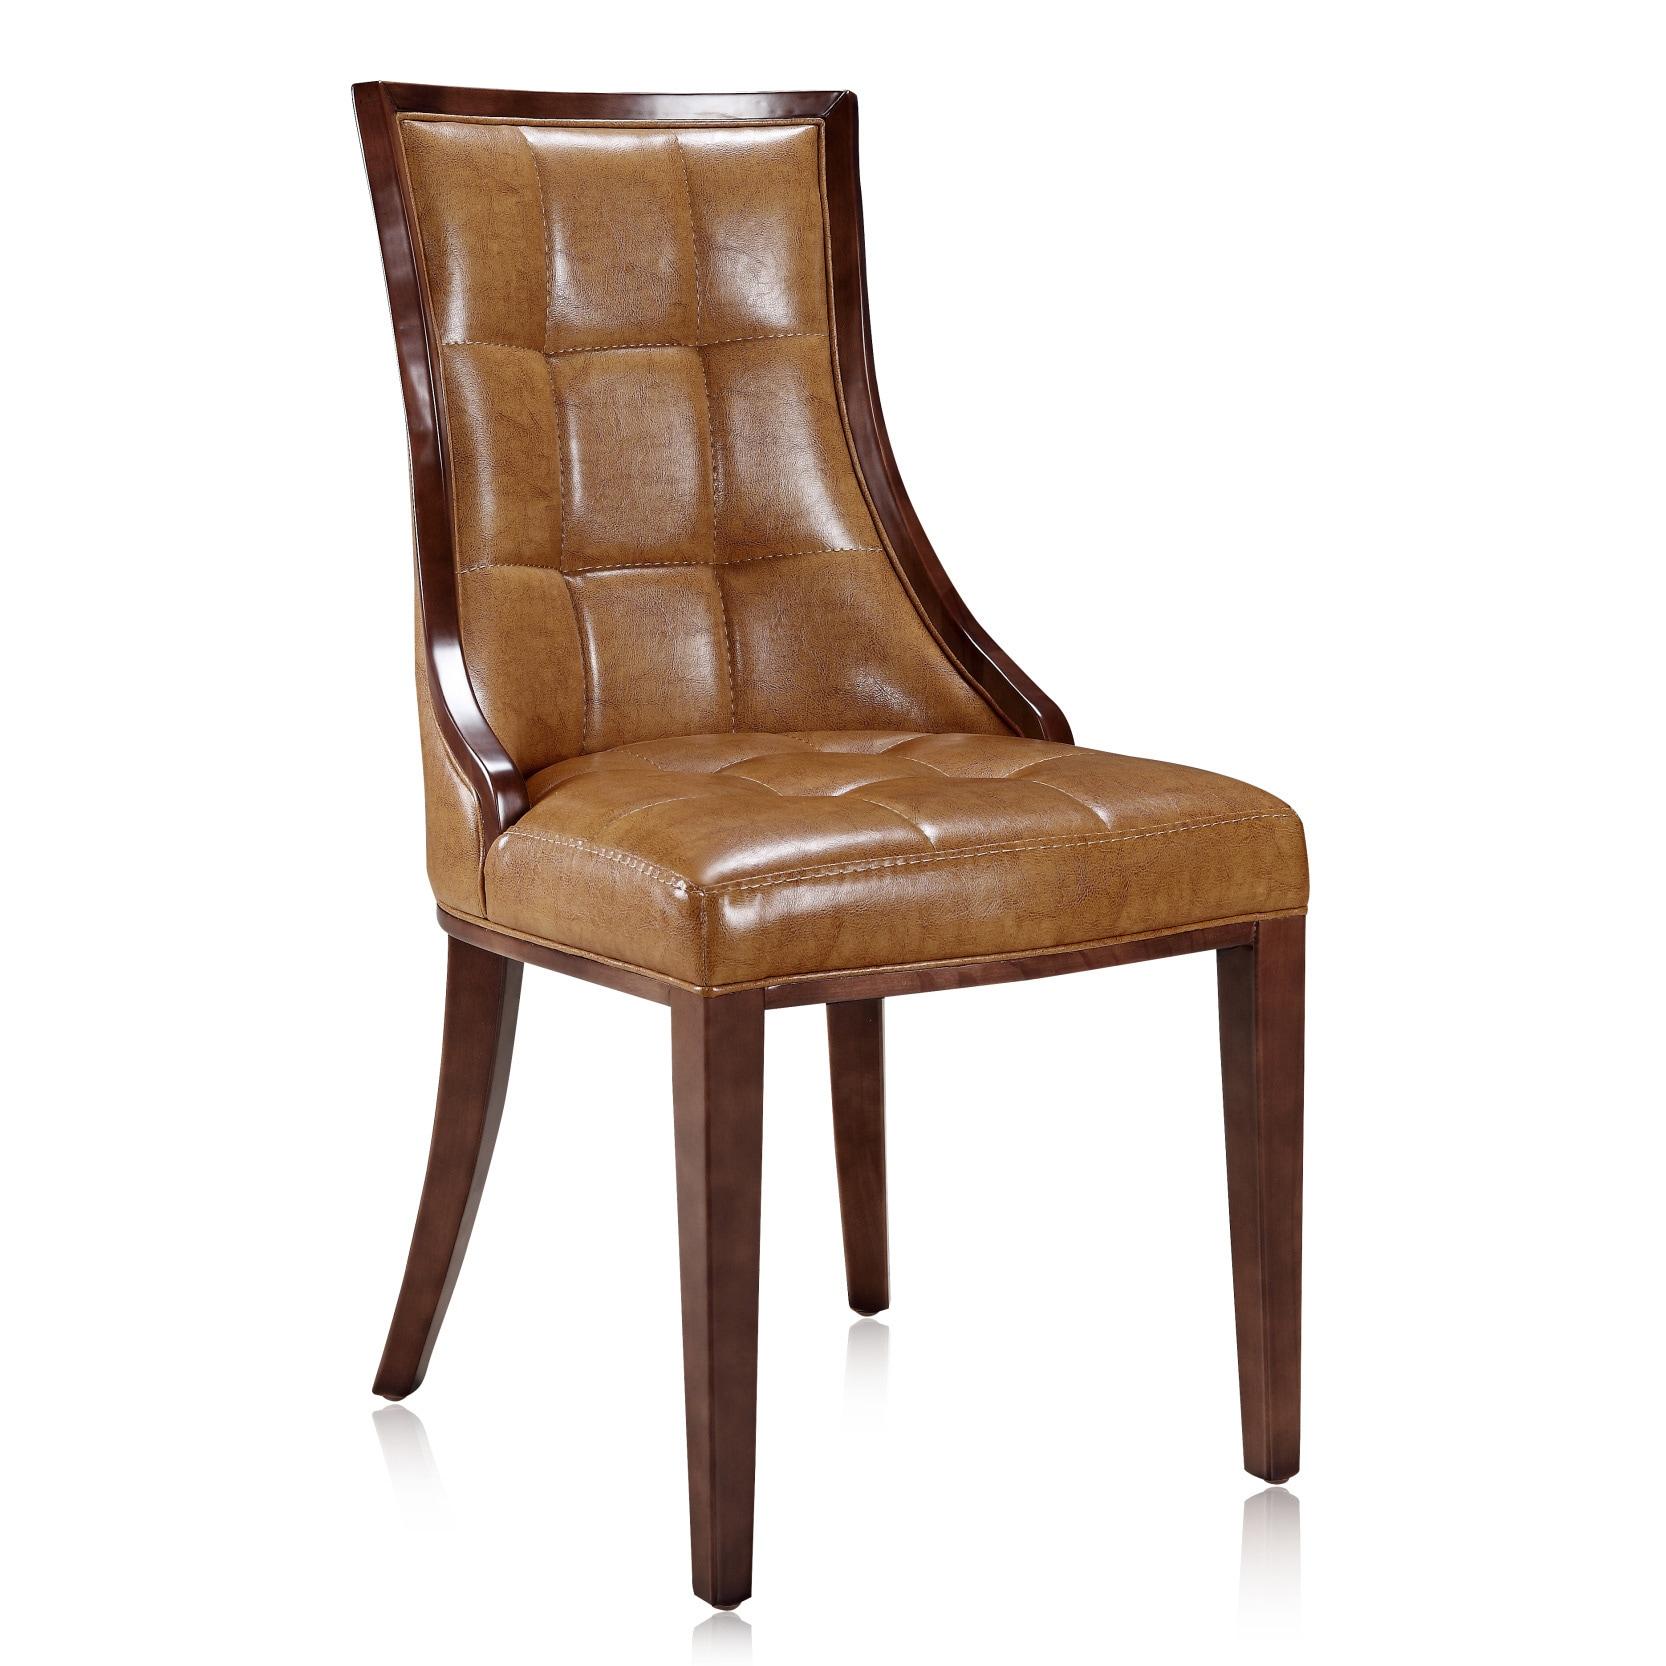 Ceets Barrel Bonded Leather Dining Chair (Set of 2) (Barr...